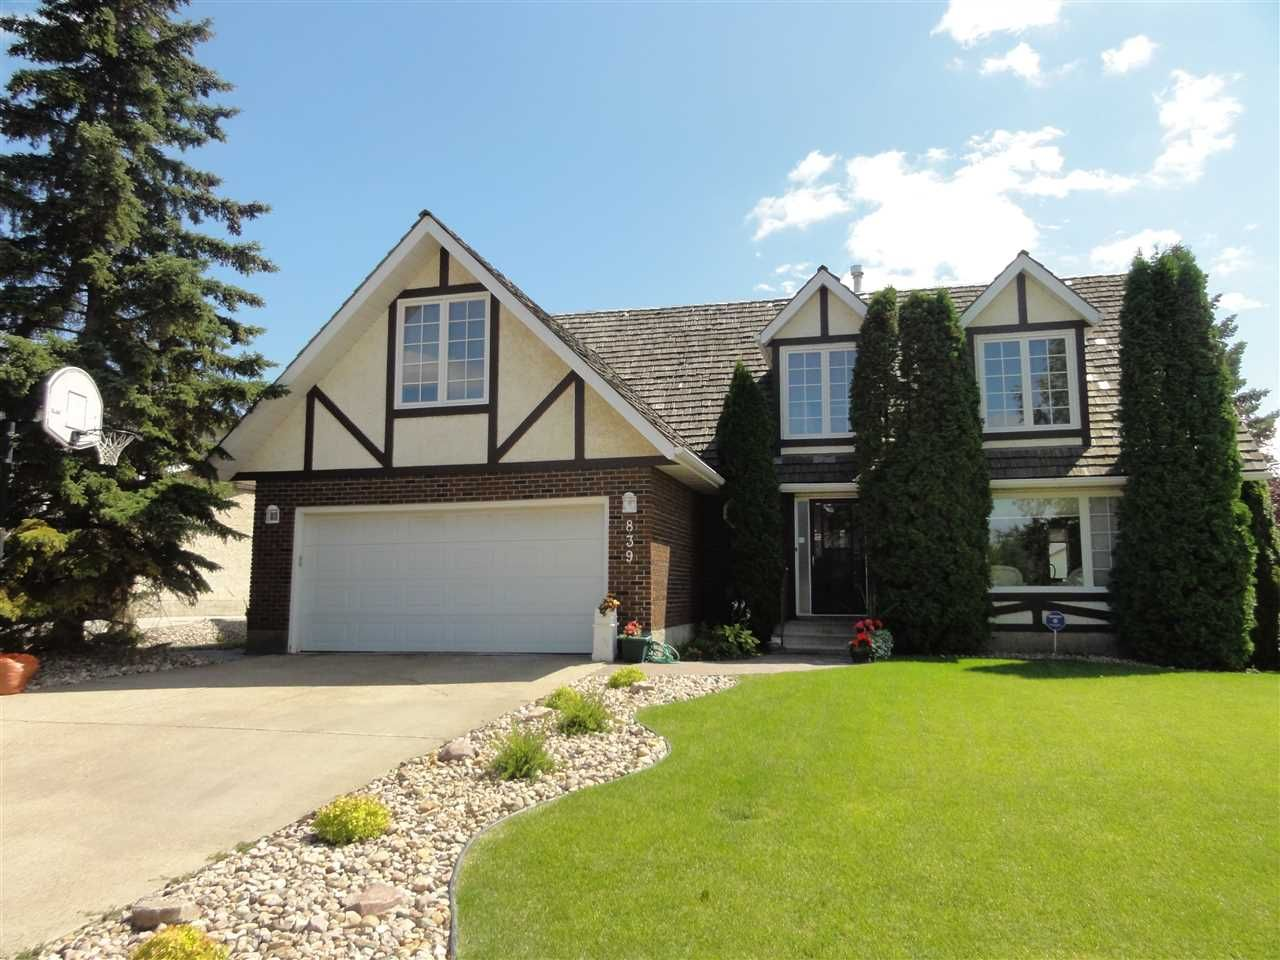 Main Photo: 839 WANYANDI Road in Edmonton: Zone 22 House for sale : MLS®# E4240208